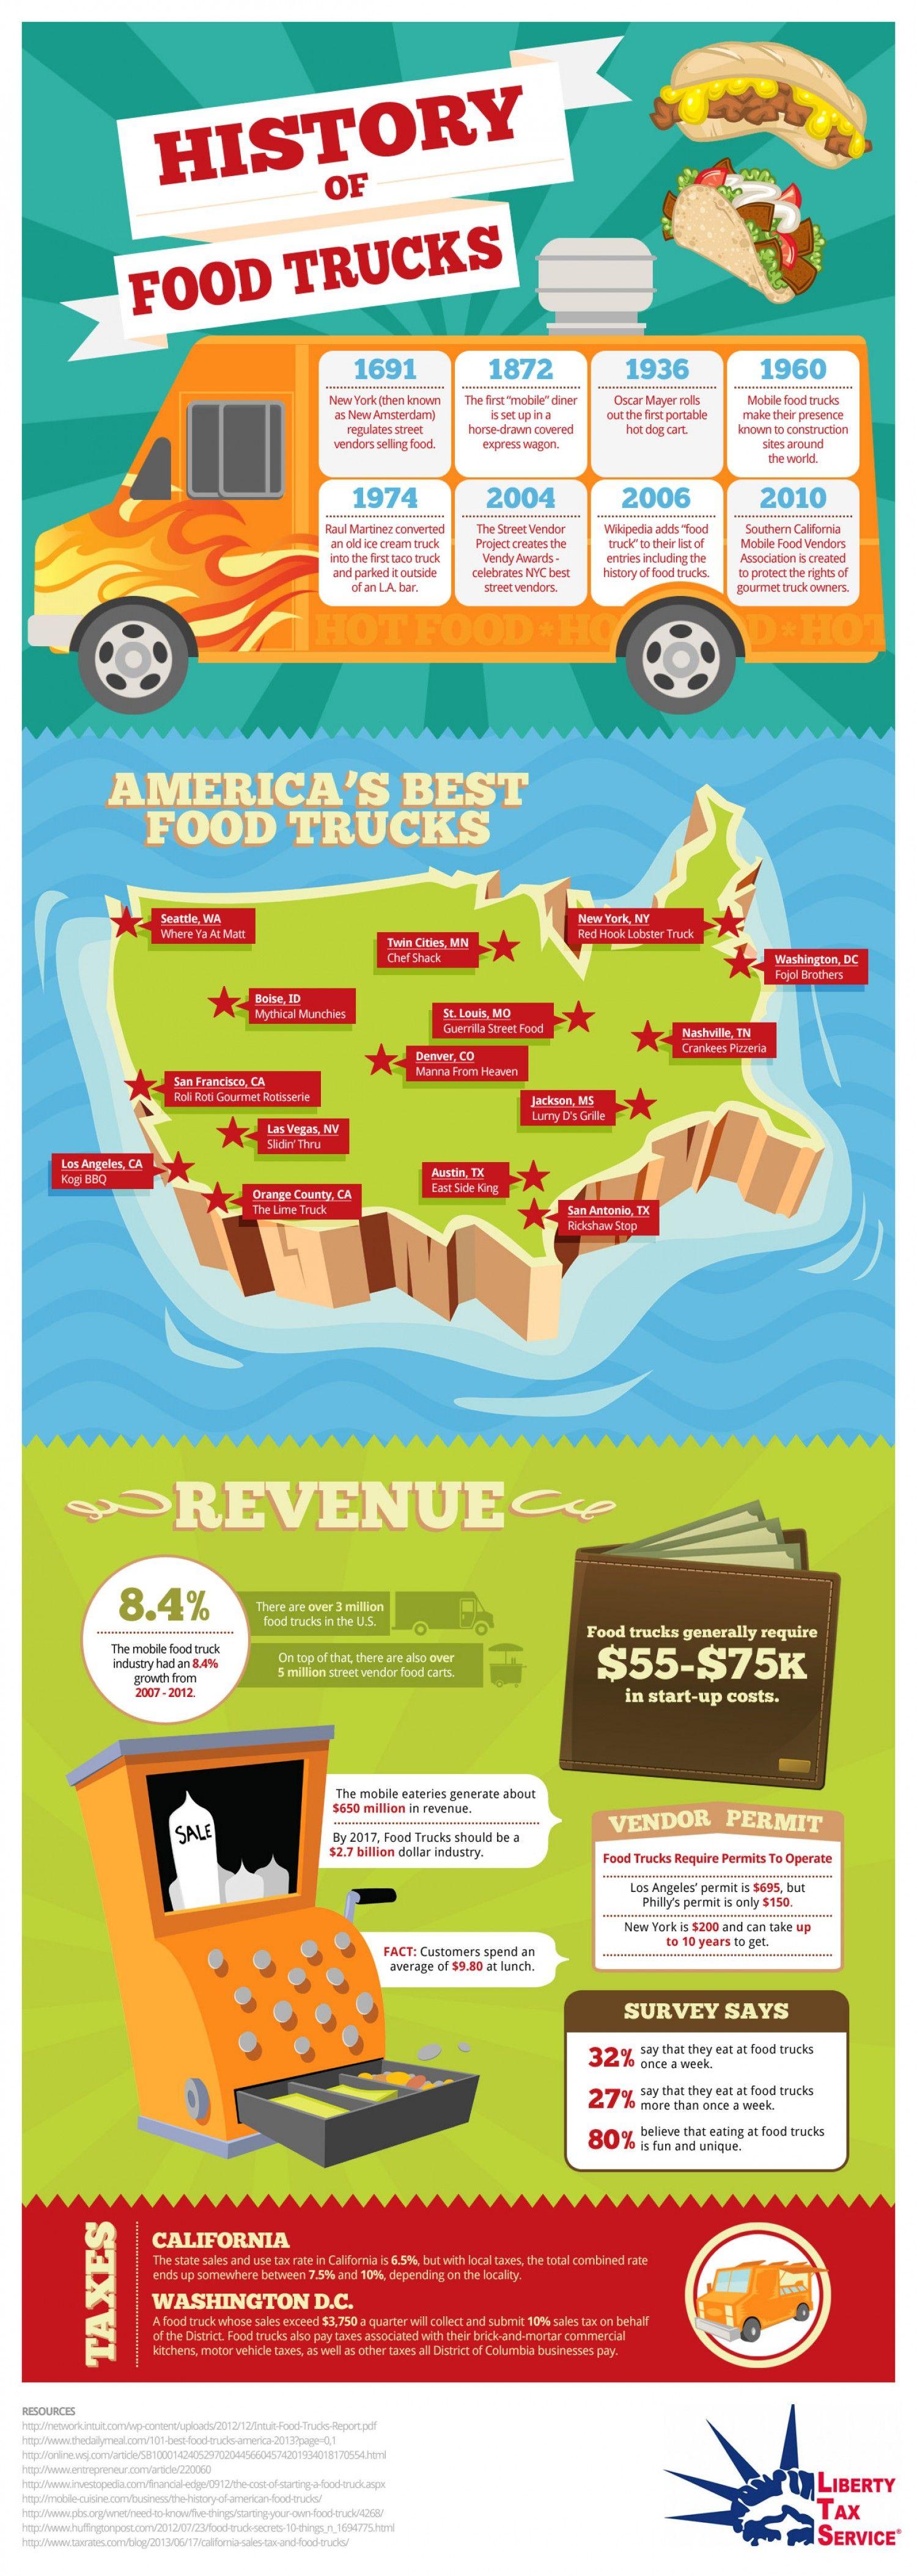 The History of Food Trucks (YUM) | Visual.ly